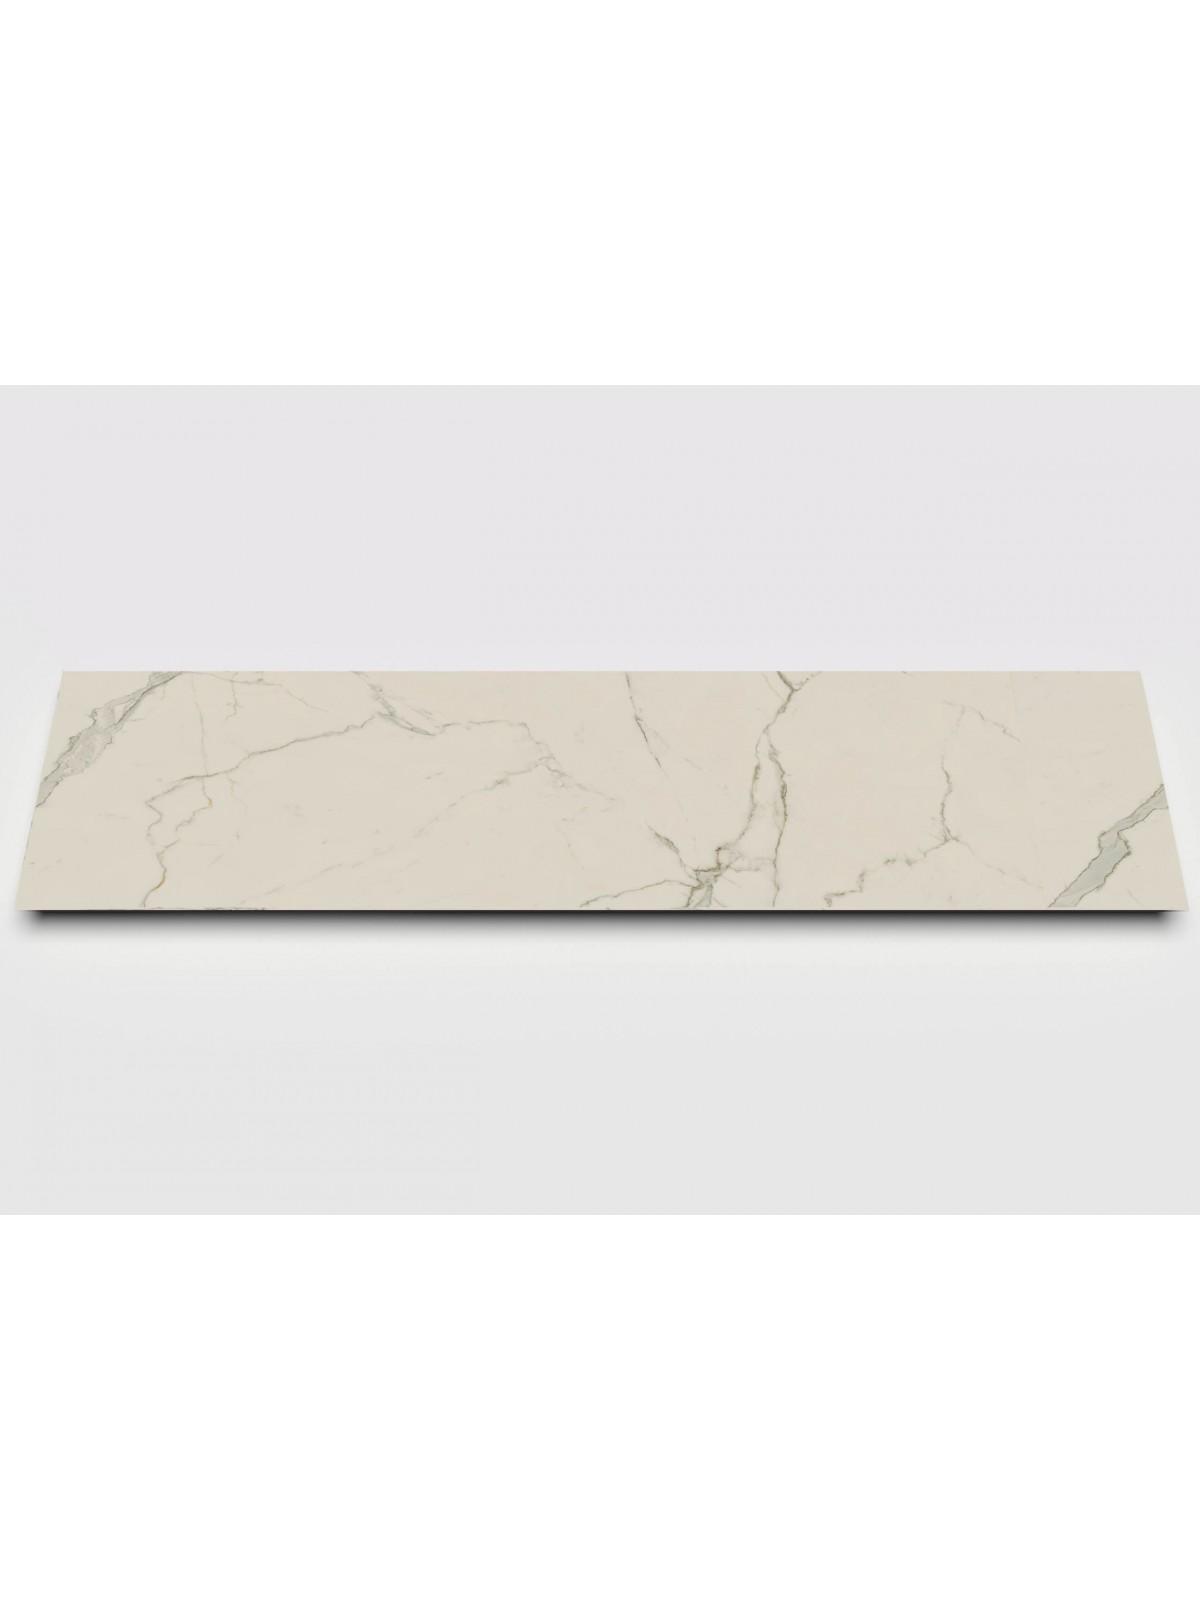 Individuelle Küchenplatte I Keramik Atlas Plan Calacatta Extra